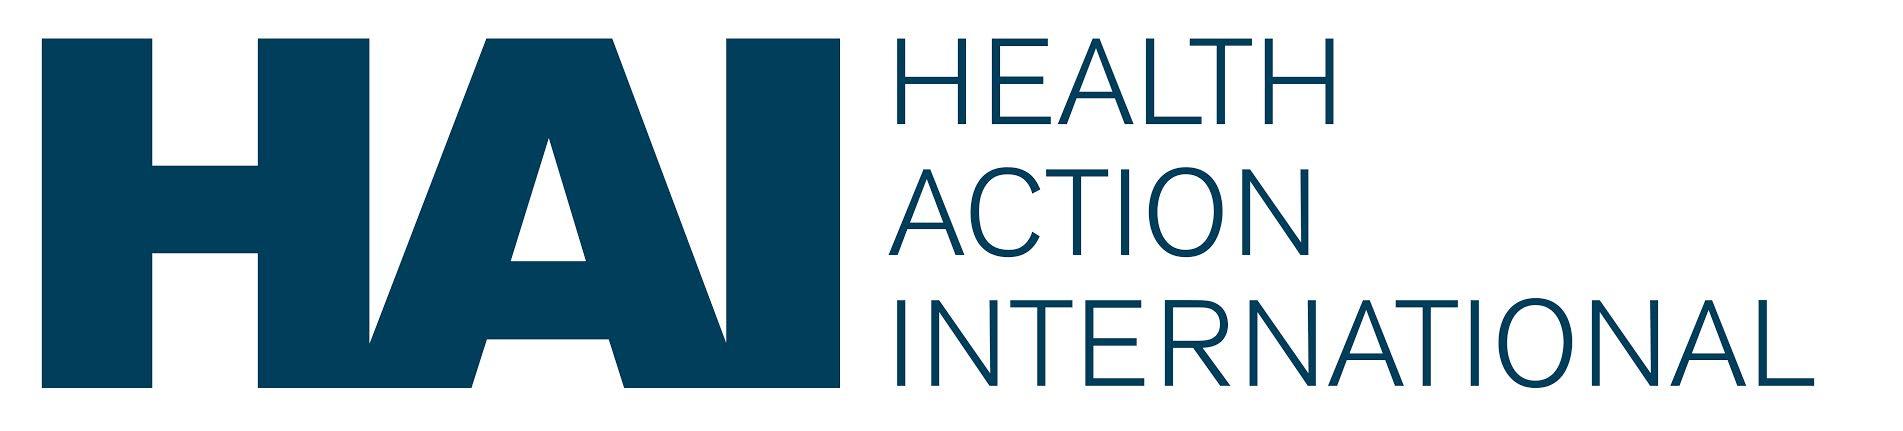 logo for Health Action International